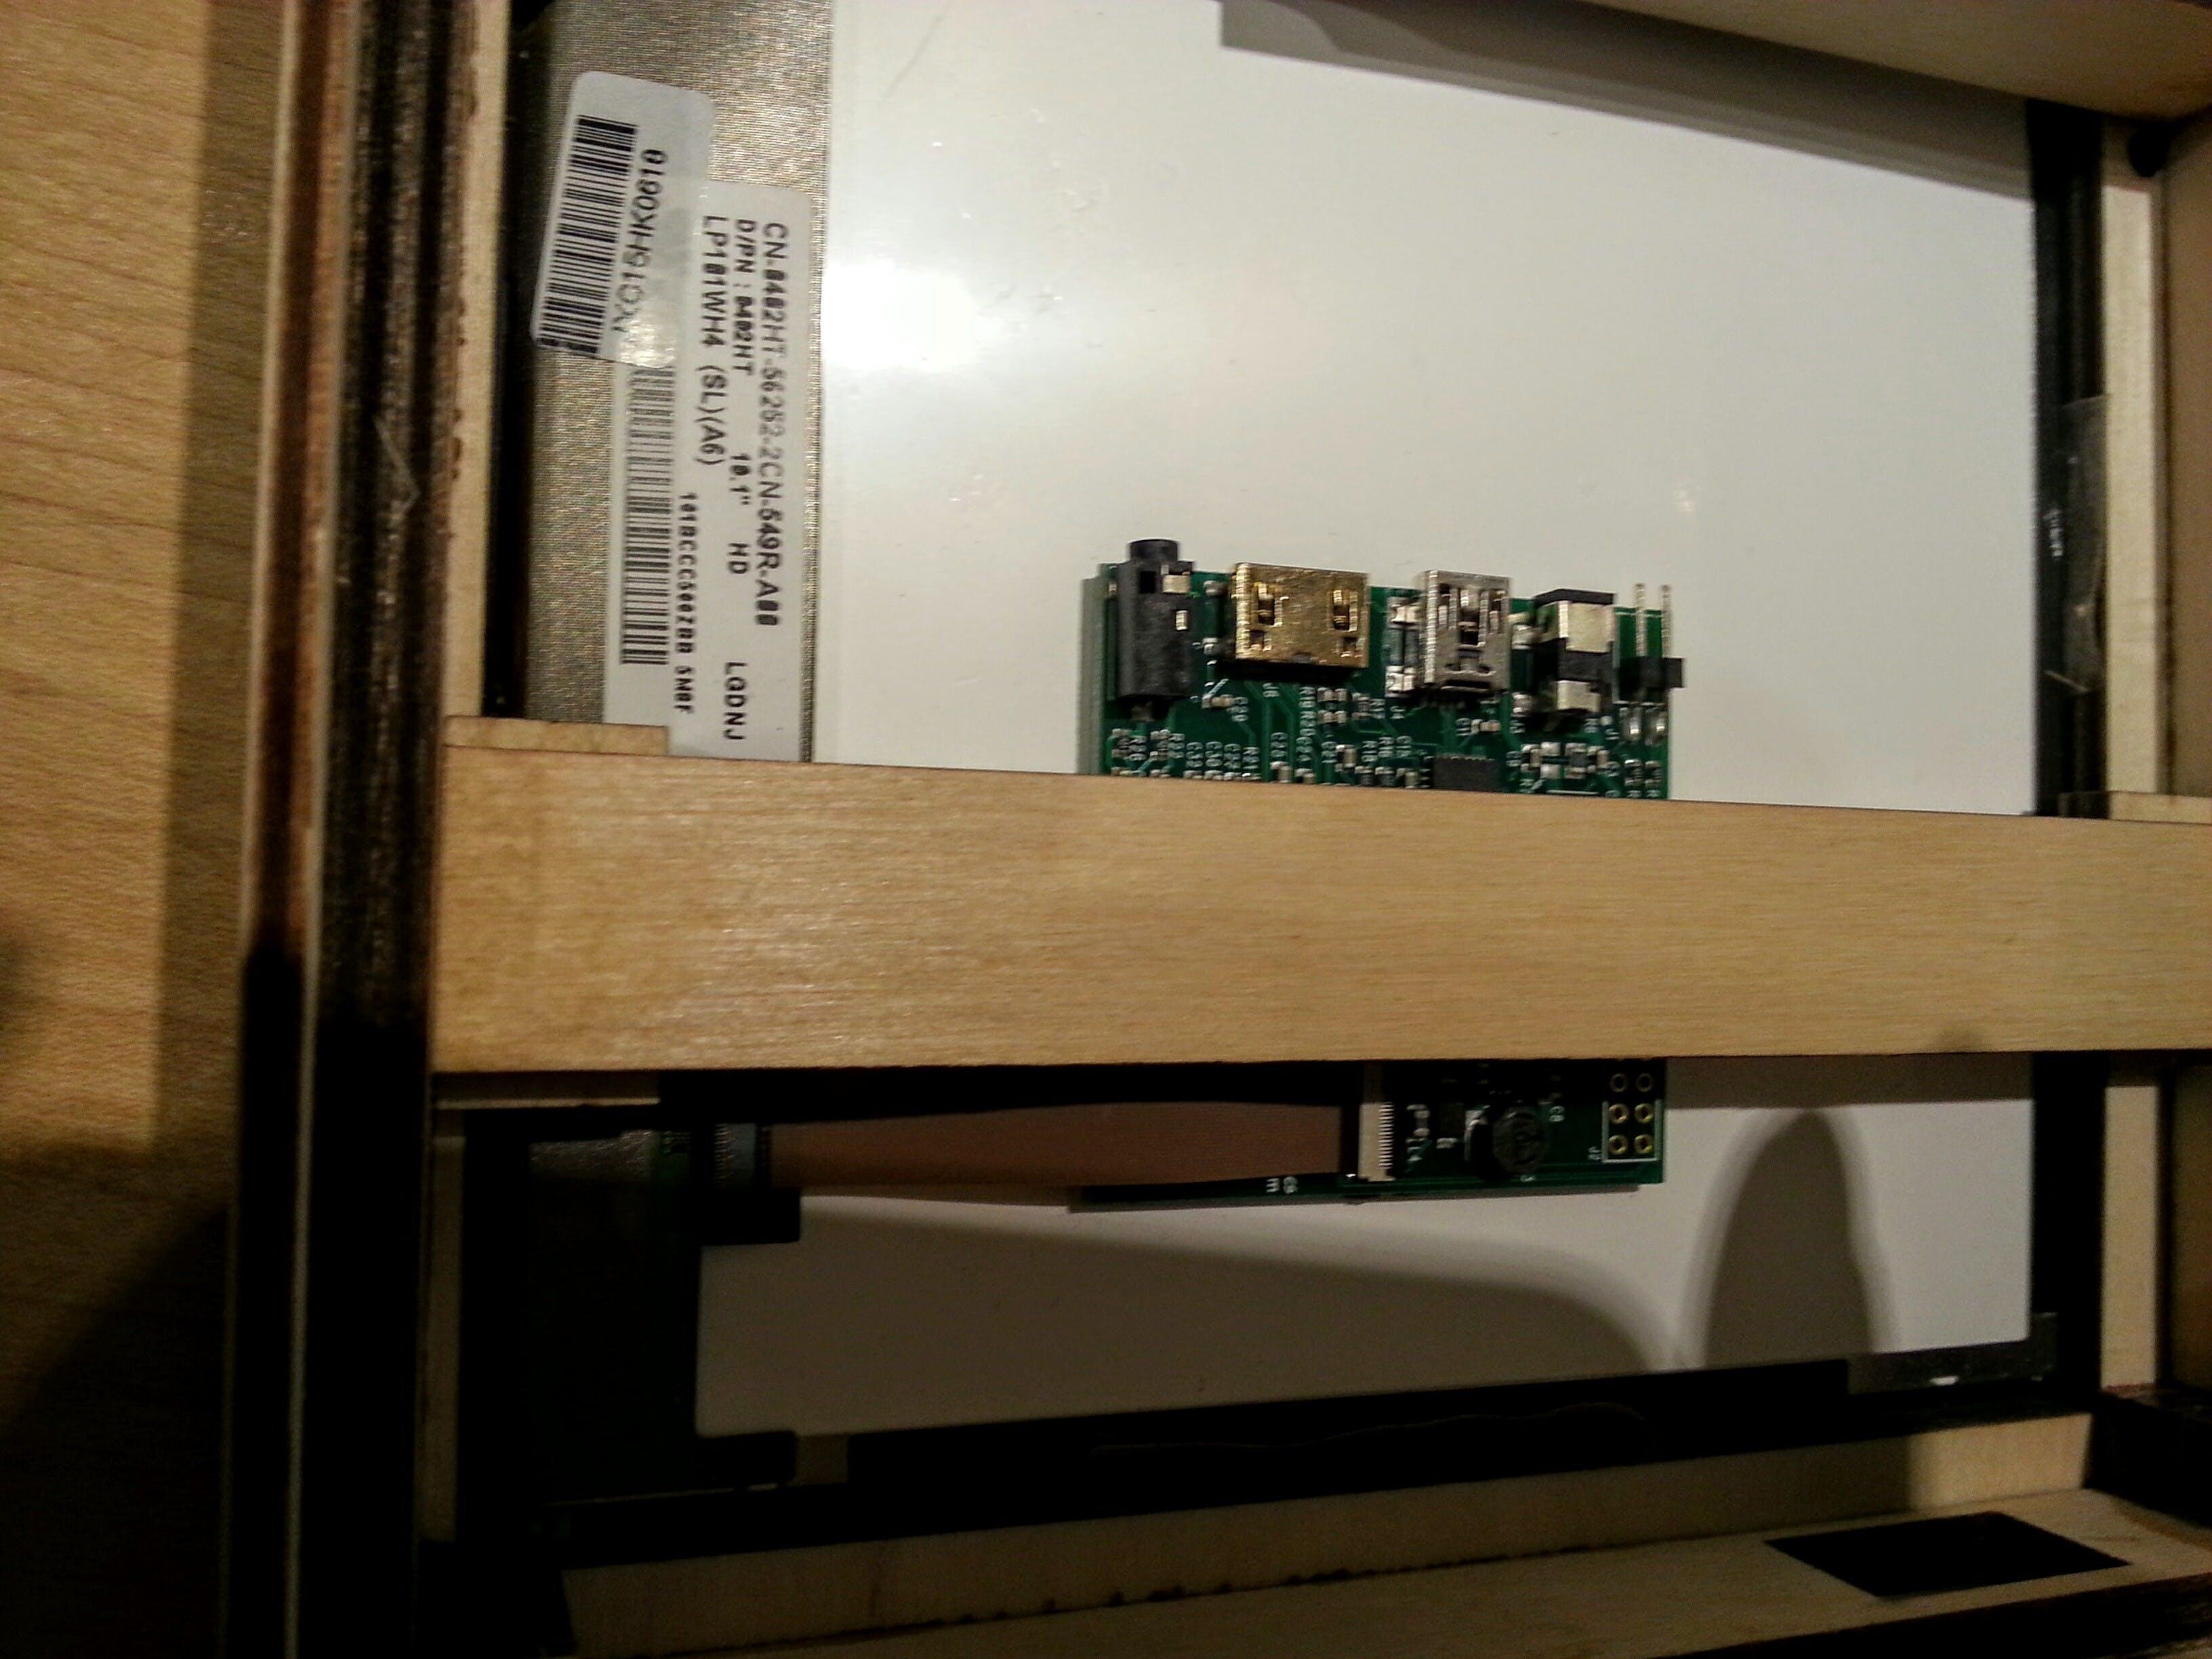 The LG type number plus HDMI/LVDS encoder